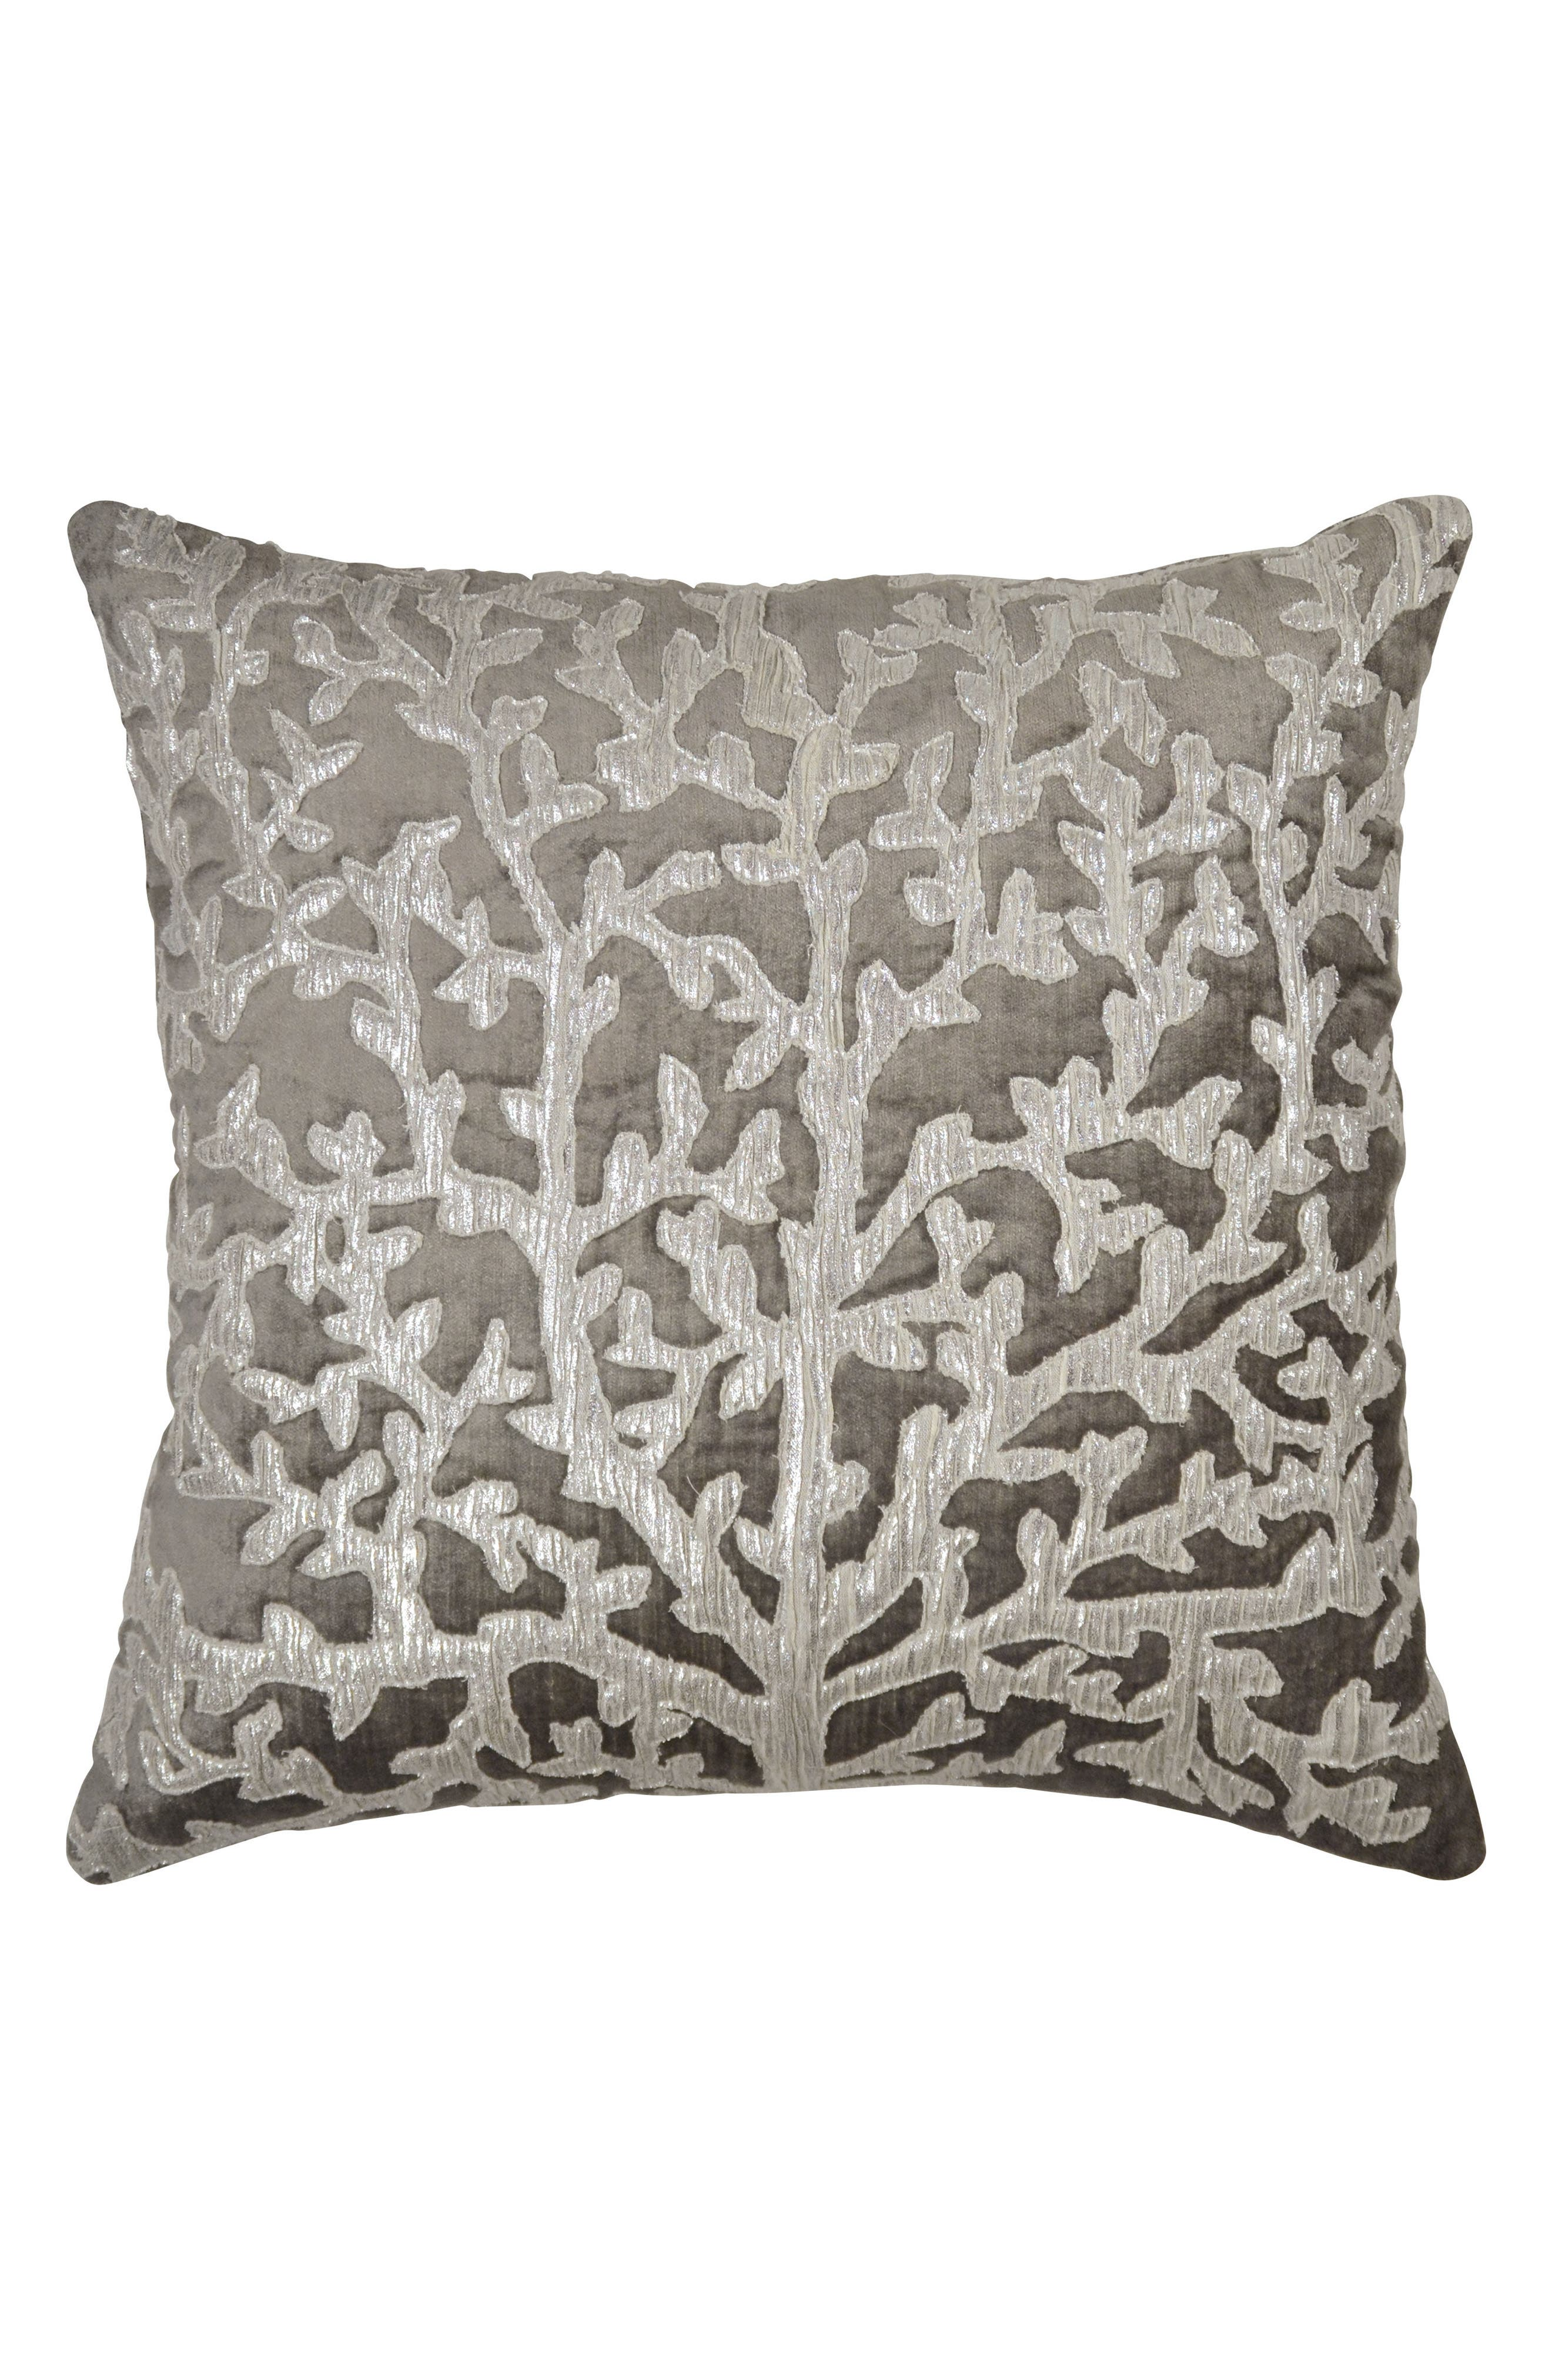 Main Image - Michael Aram Tree of Life Appliqué Accent Pillow